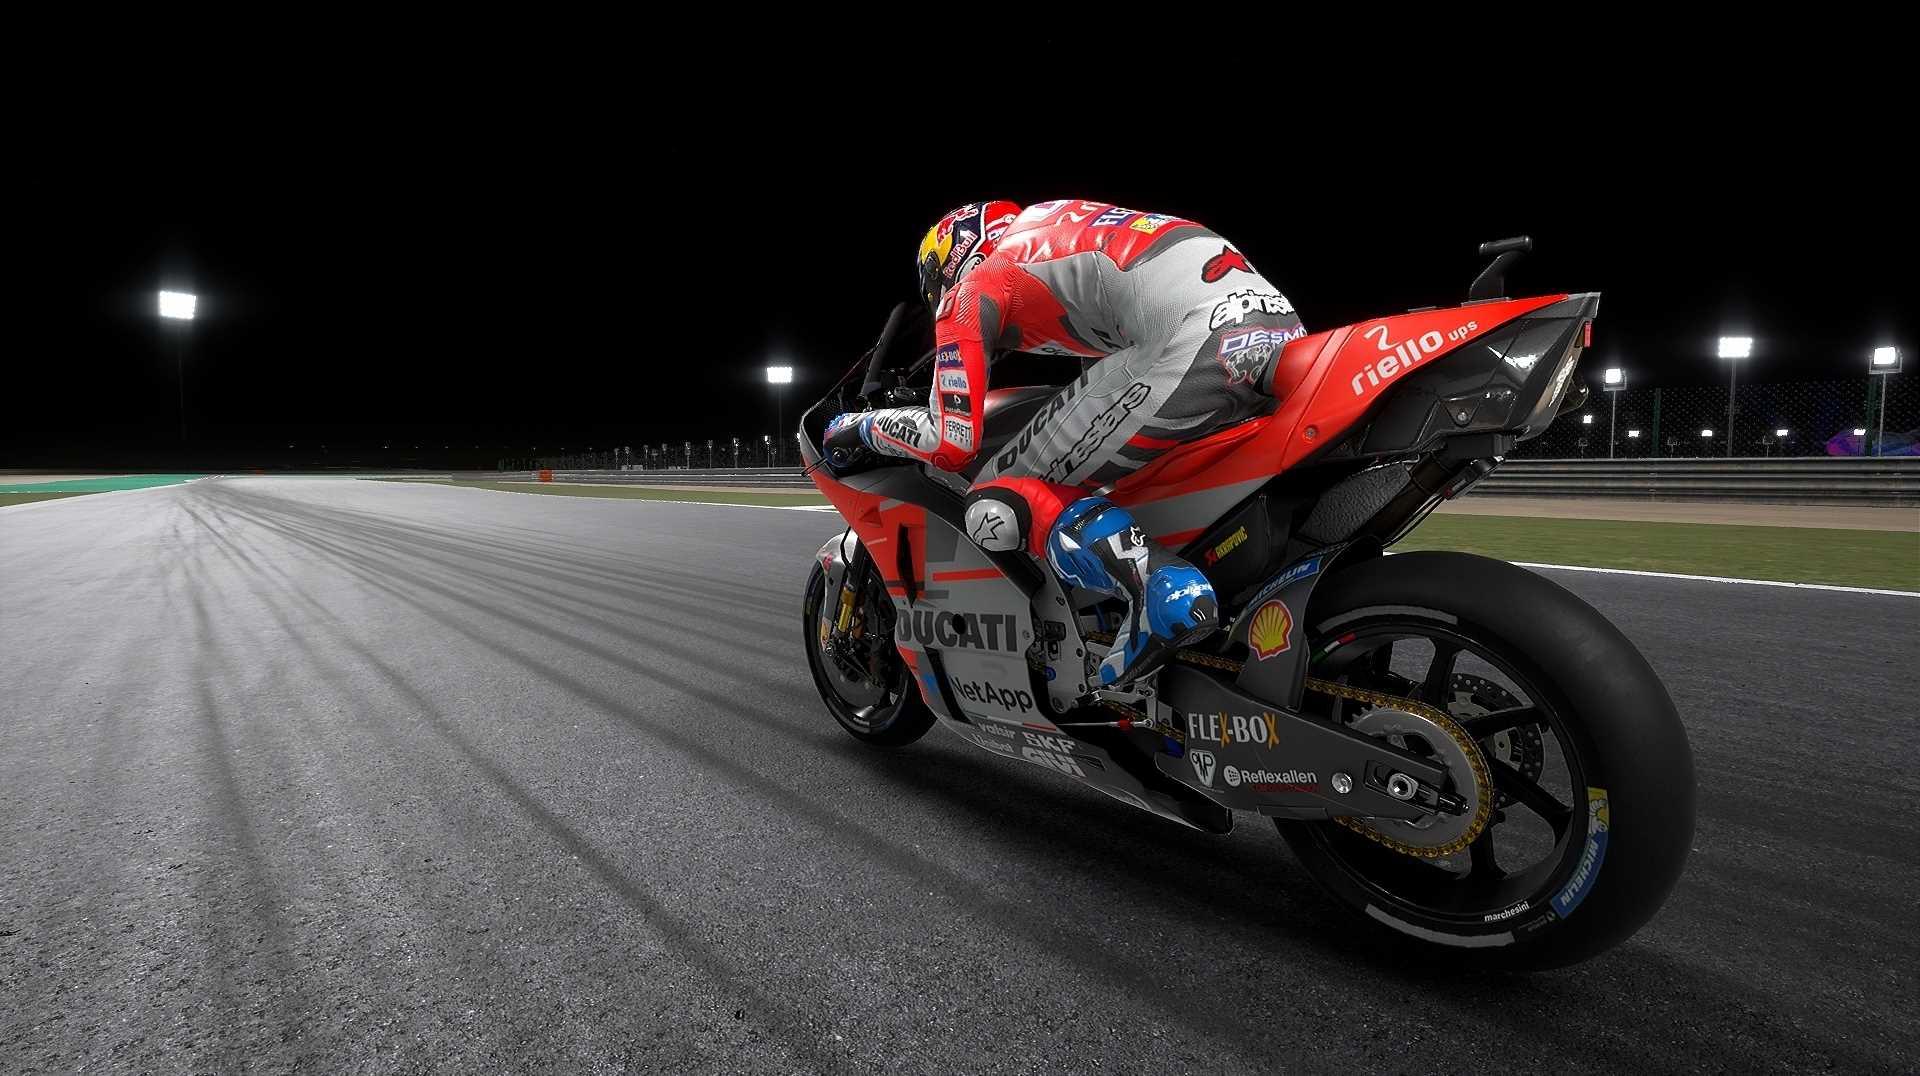 MotoGP 19 Cover